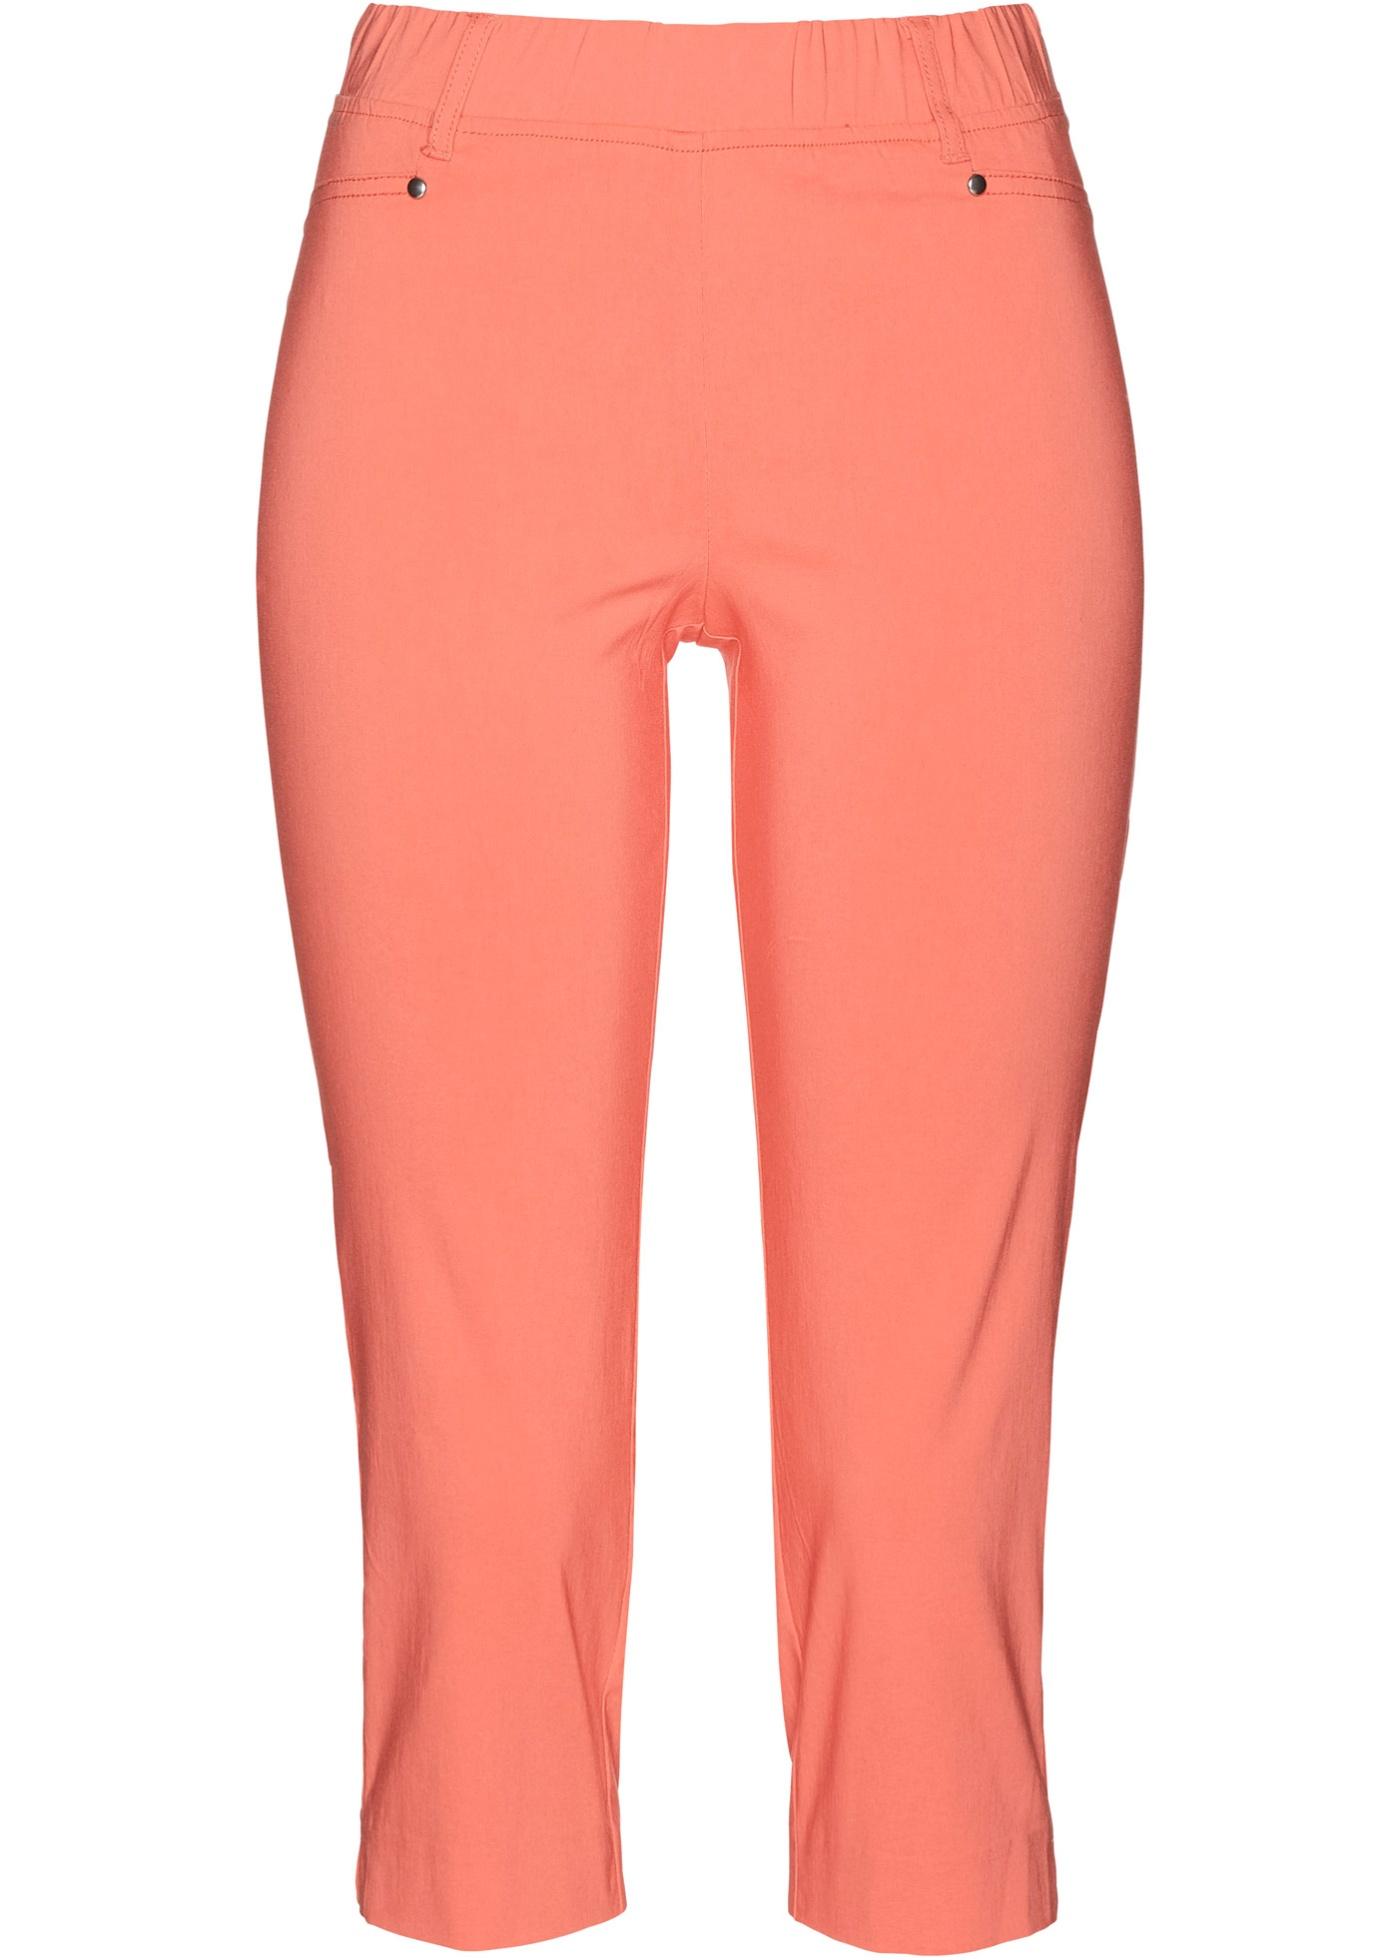 Hosen - Stretchcapri mit Schlupfbund › bonprix › orange  - Onlineshop Bonprix